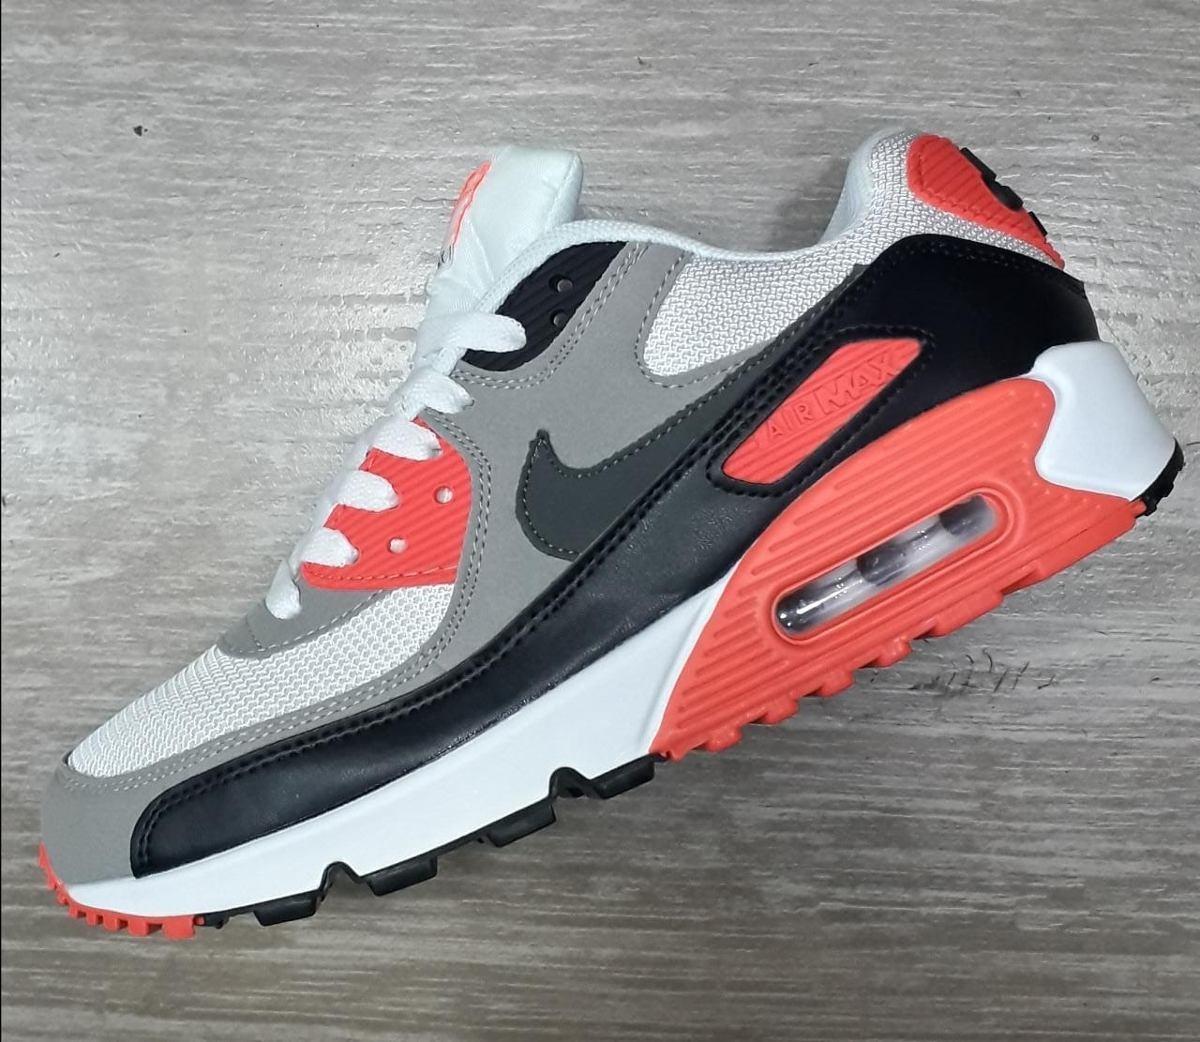 caliente Zapatillas Nike Air Max 90 Infrared Naranja Dama